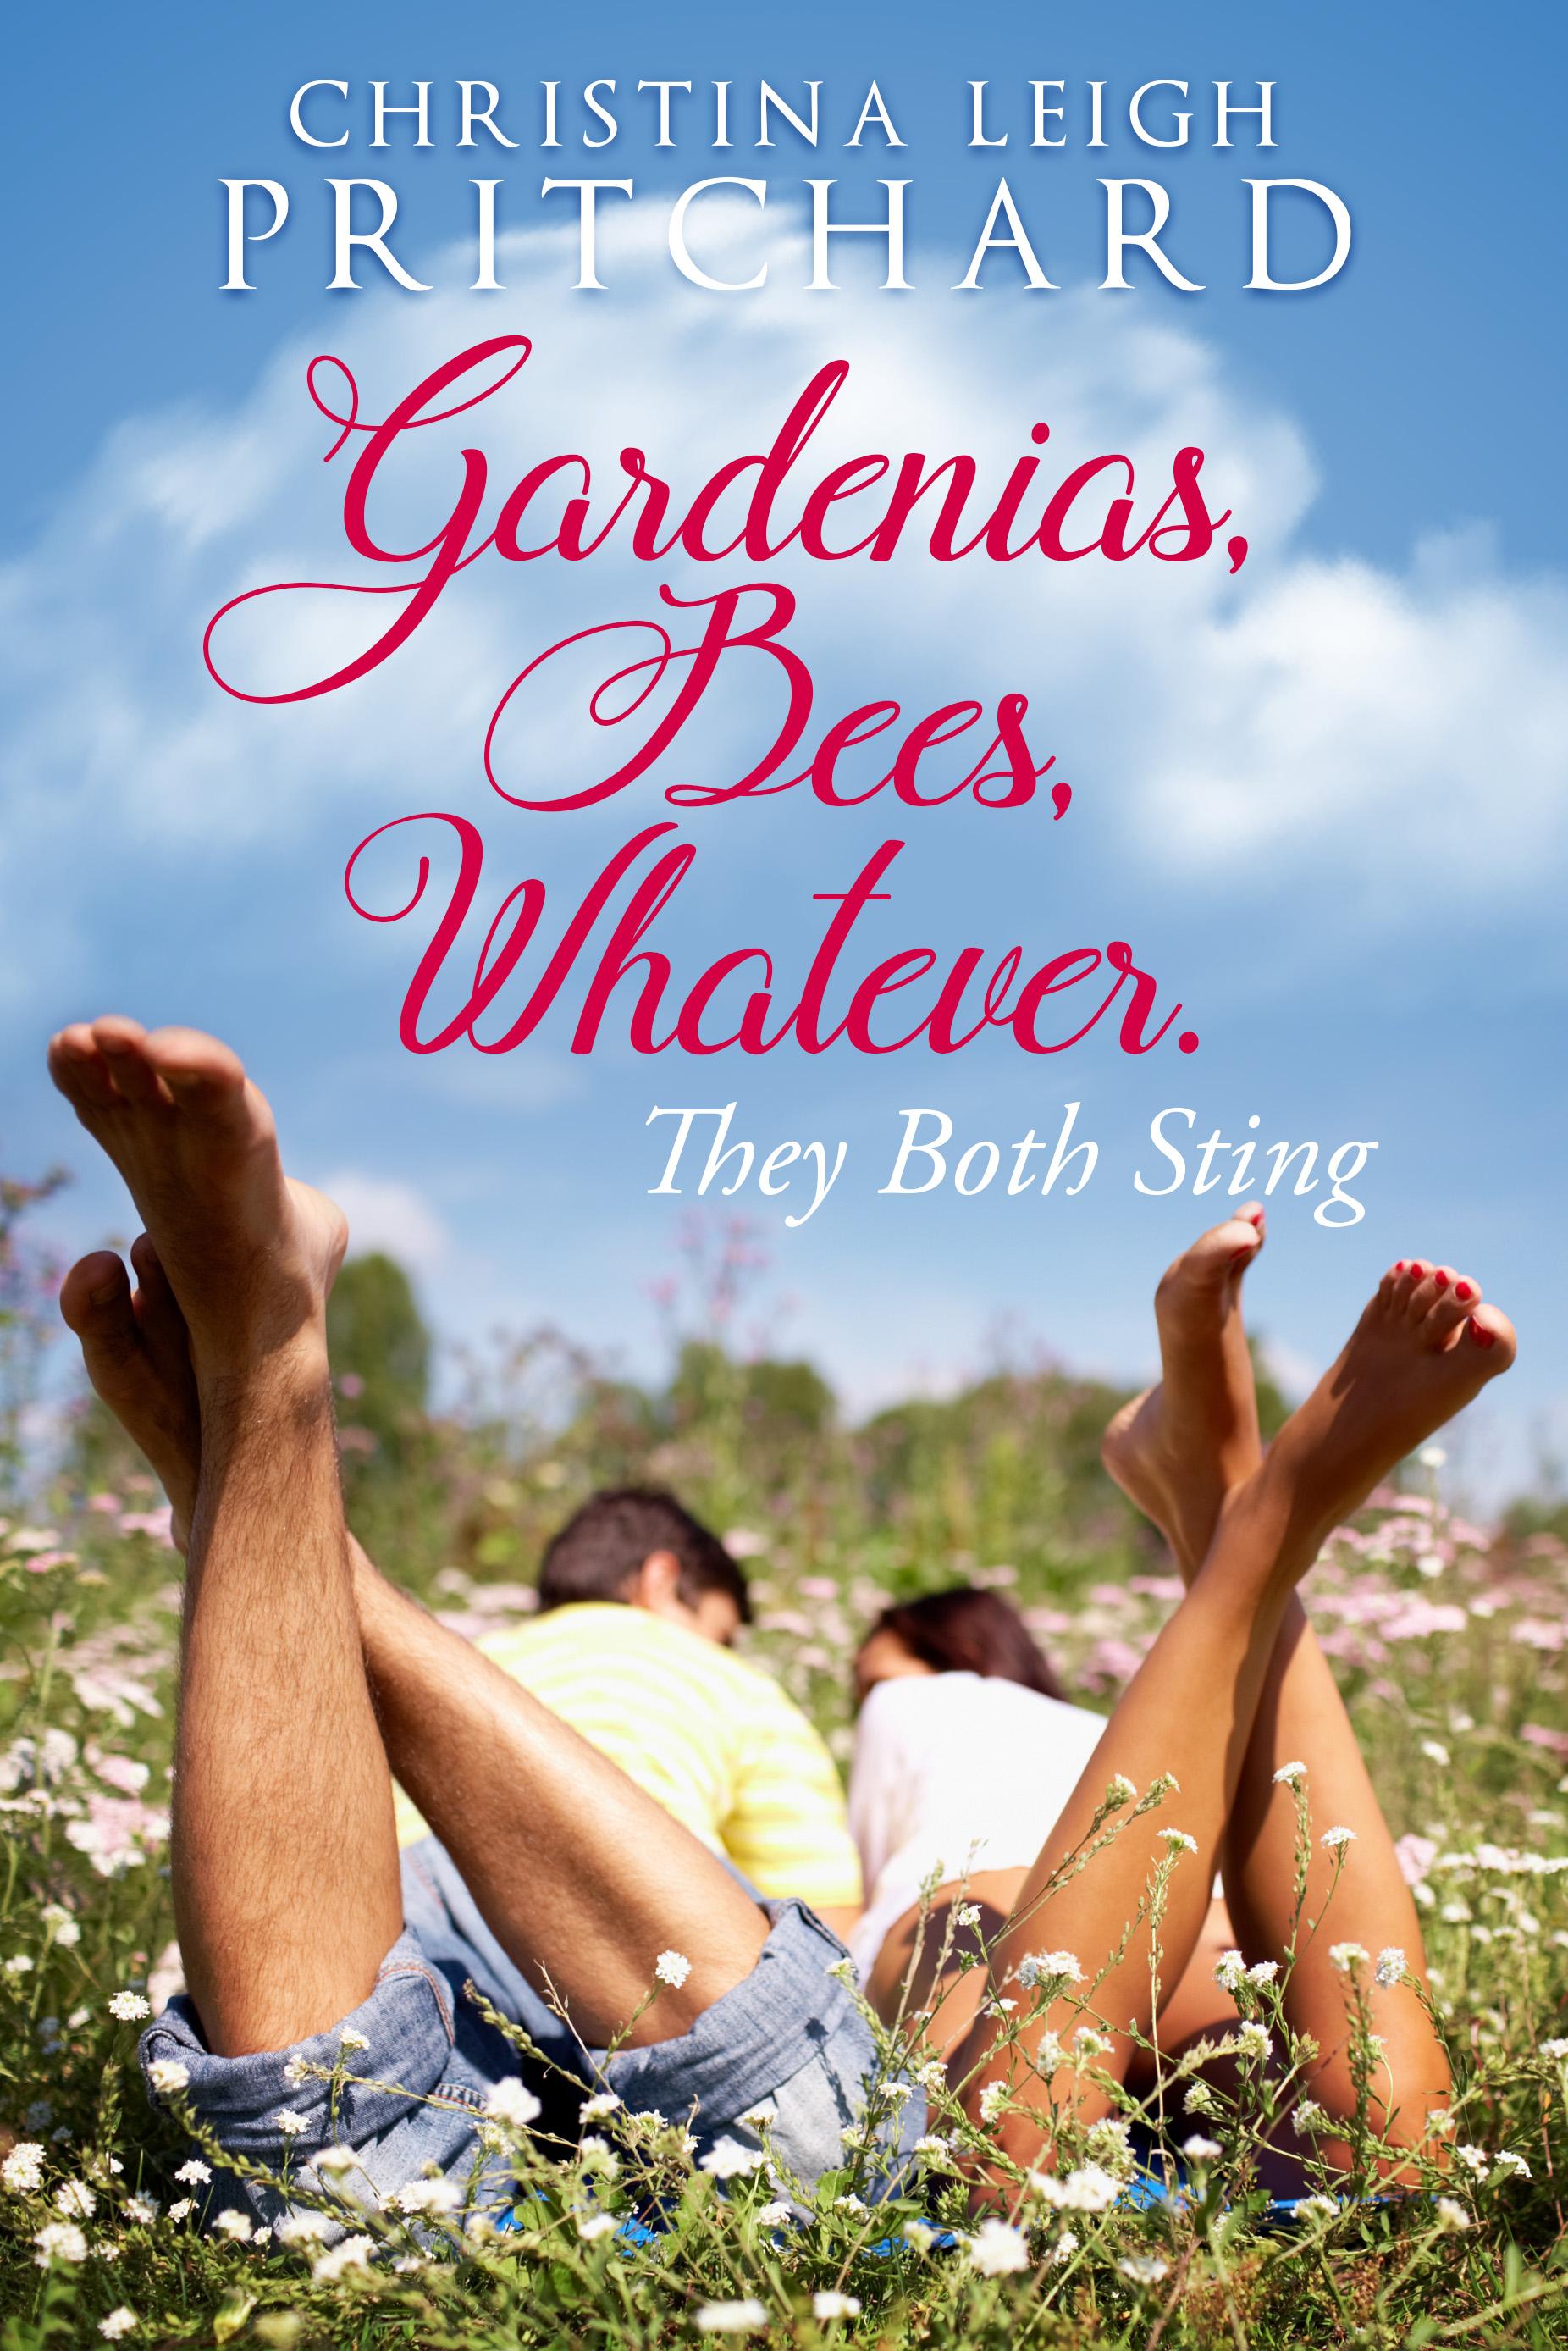 Gardenias, Bees, Whatever.